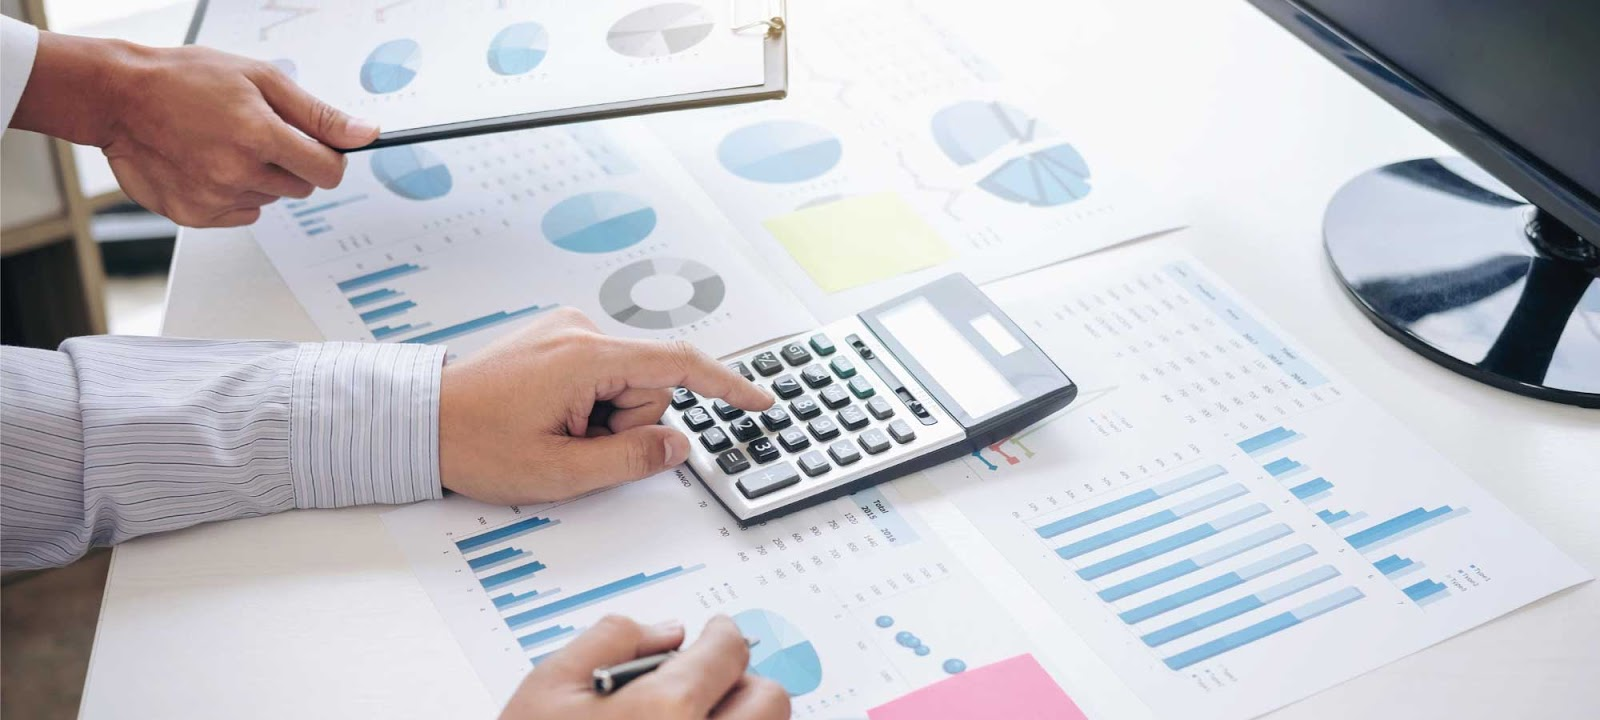 Pembukuan Usaha Kecil dan Menengah - Cara Membuat Laporan Keuangan ...